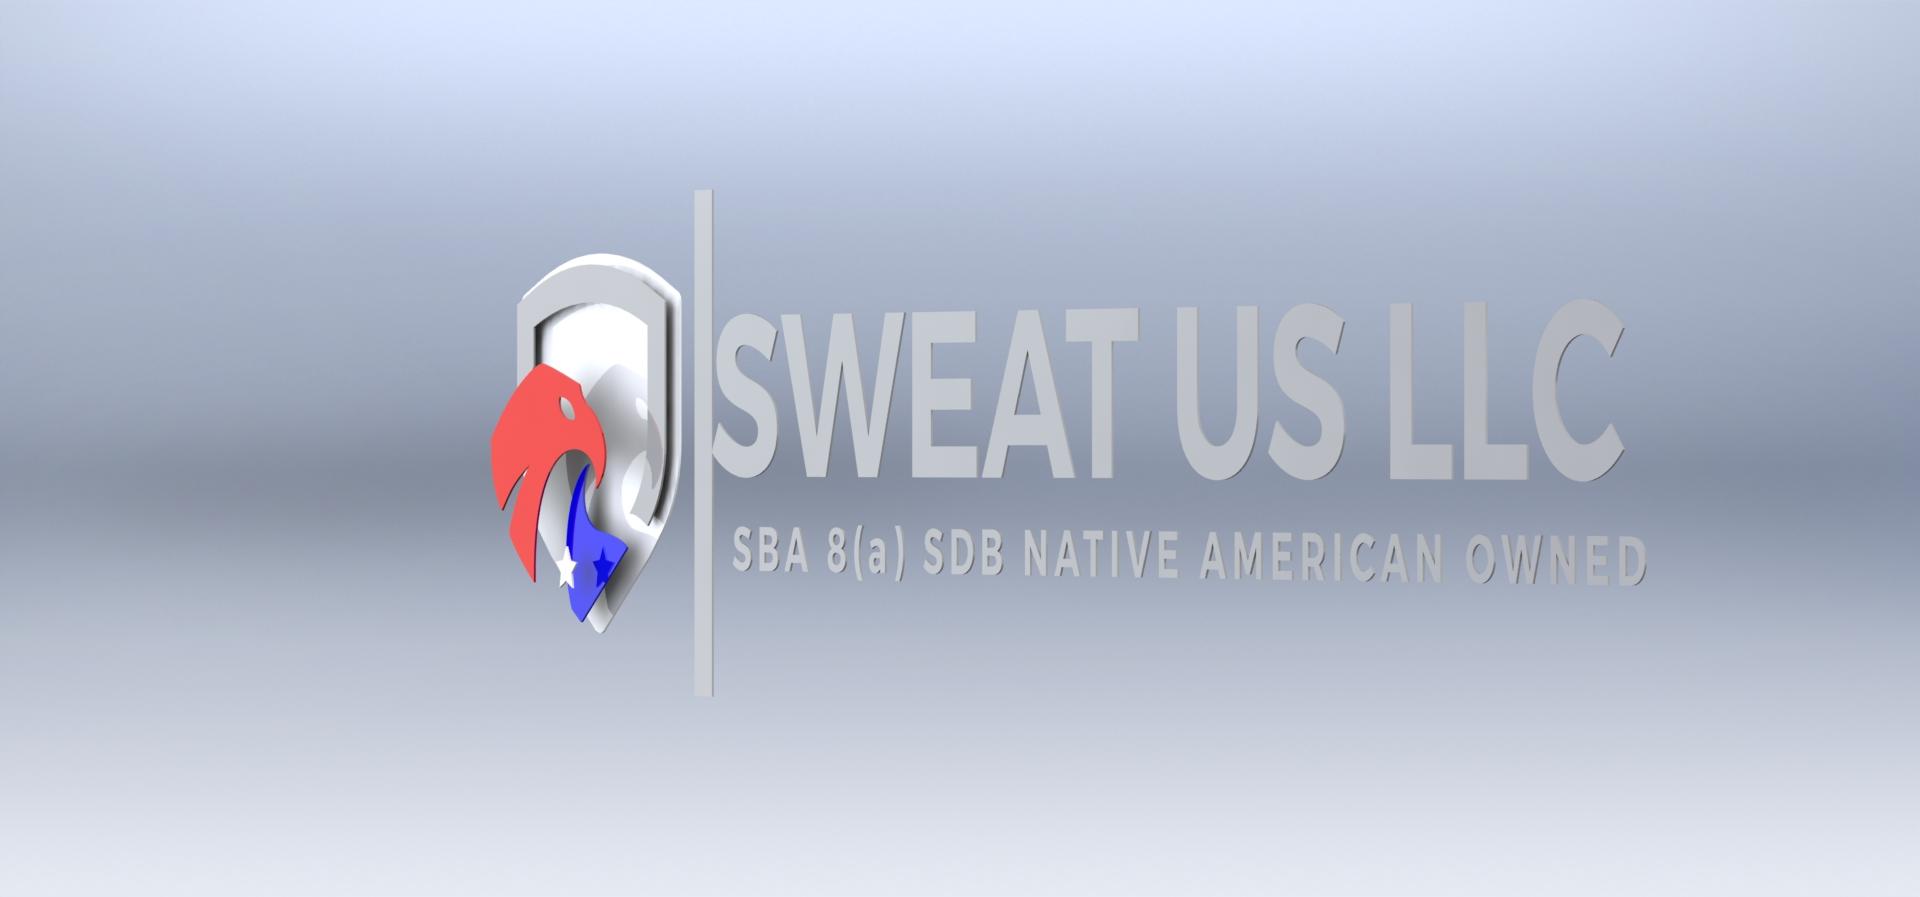 p2 - right - Sweat US LLC.JPG